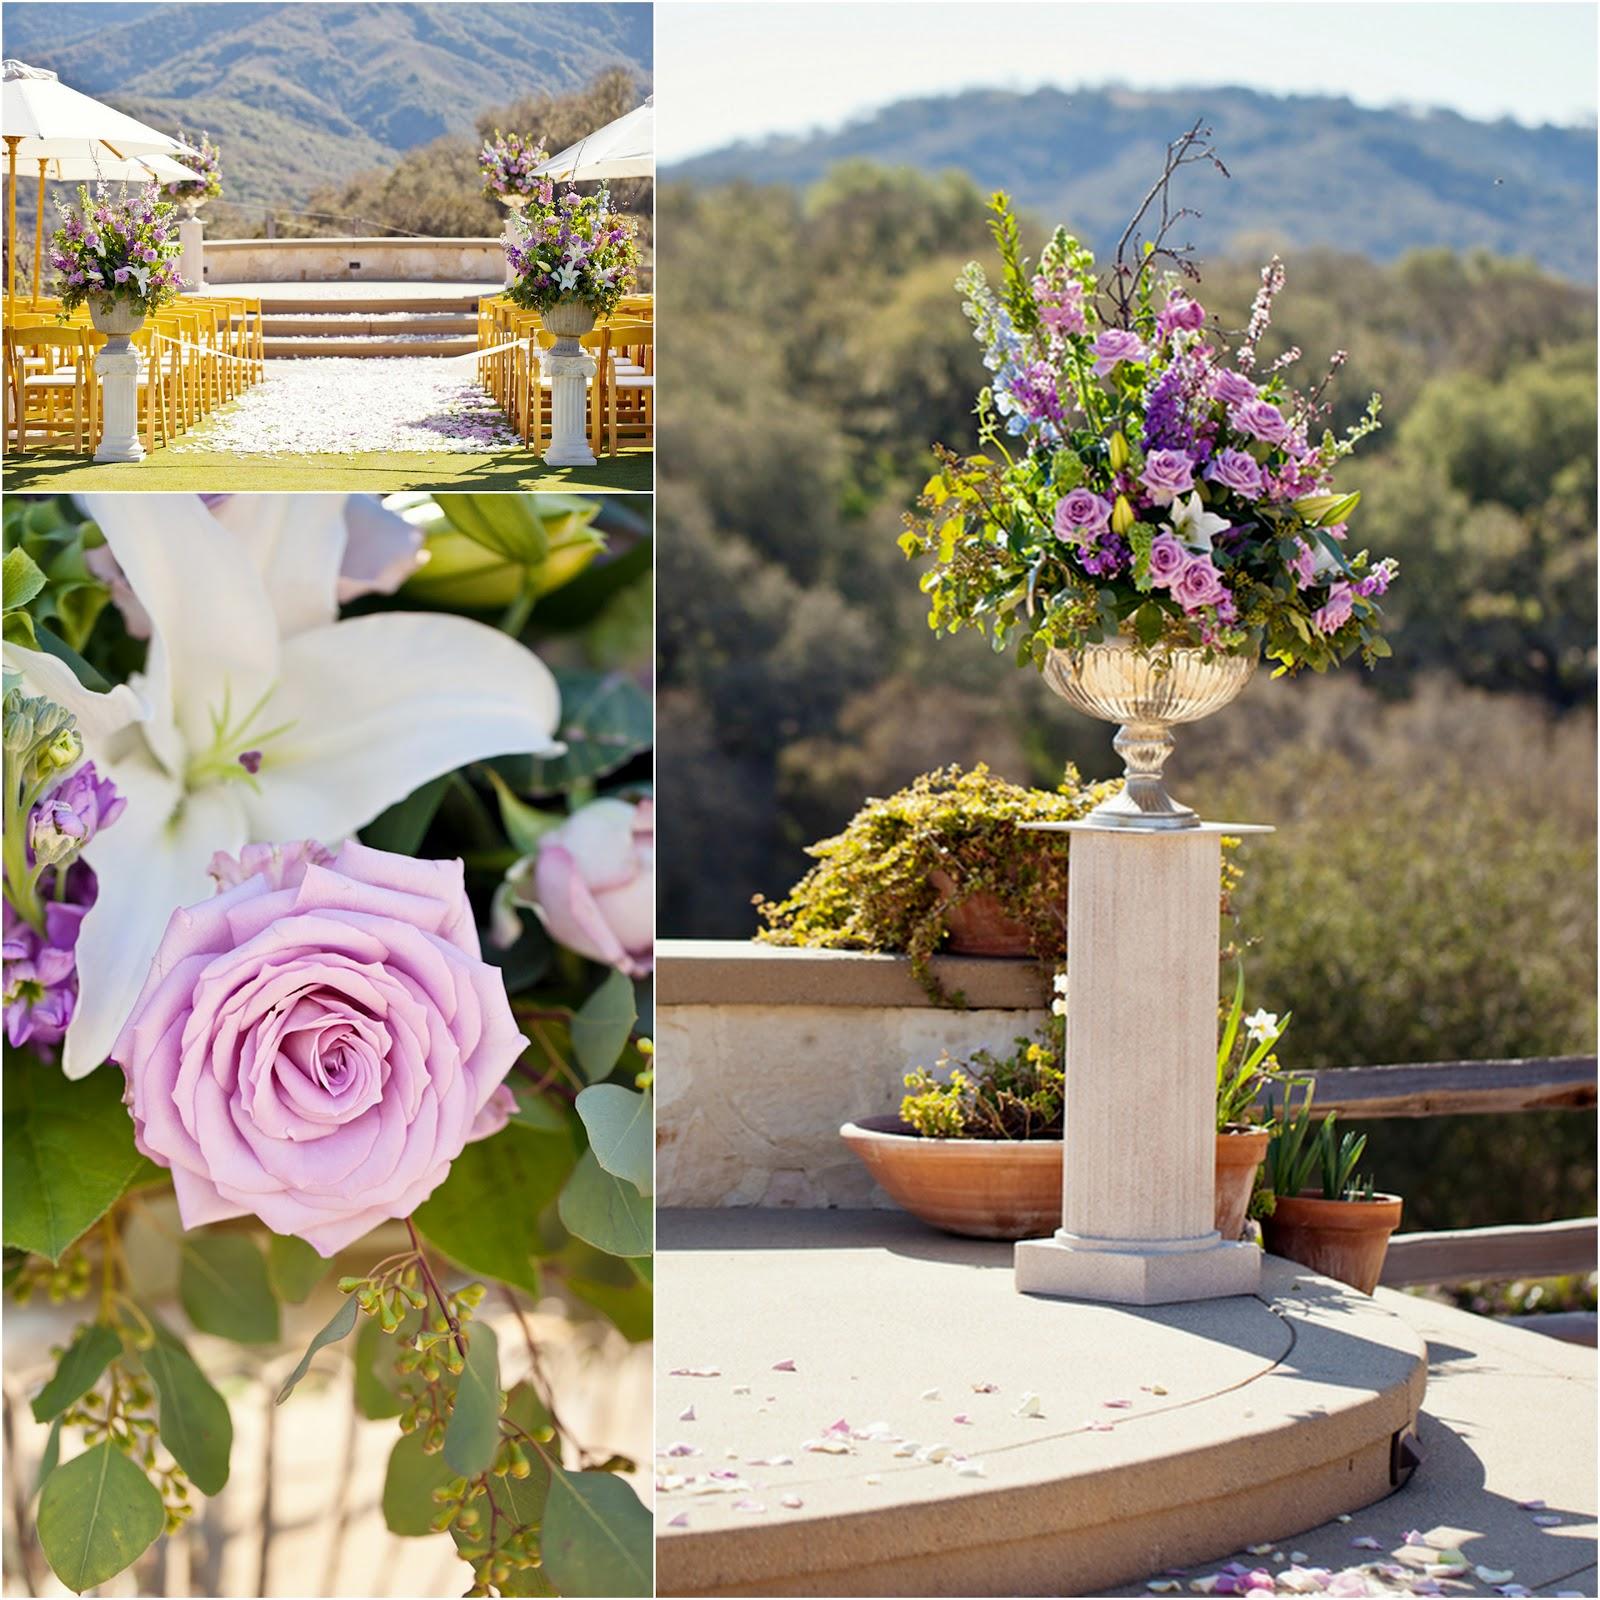 Harmony vineyards wedding